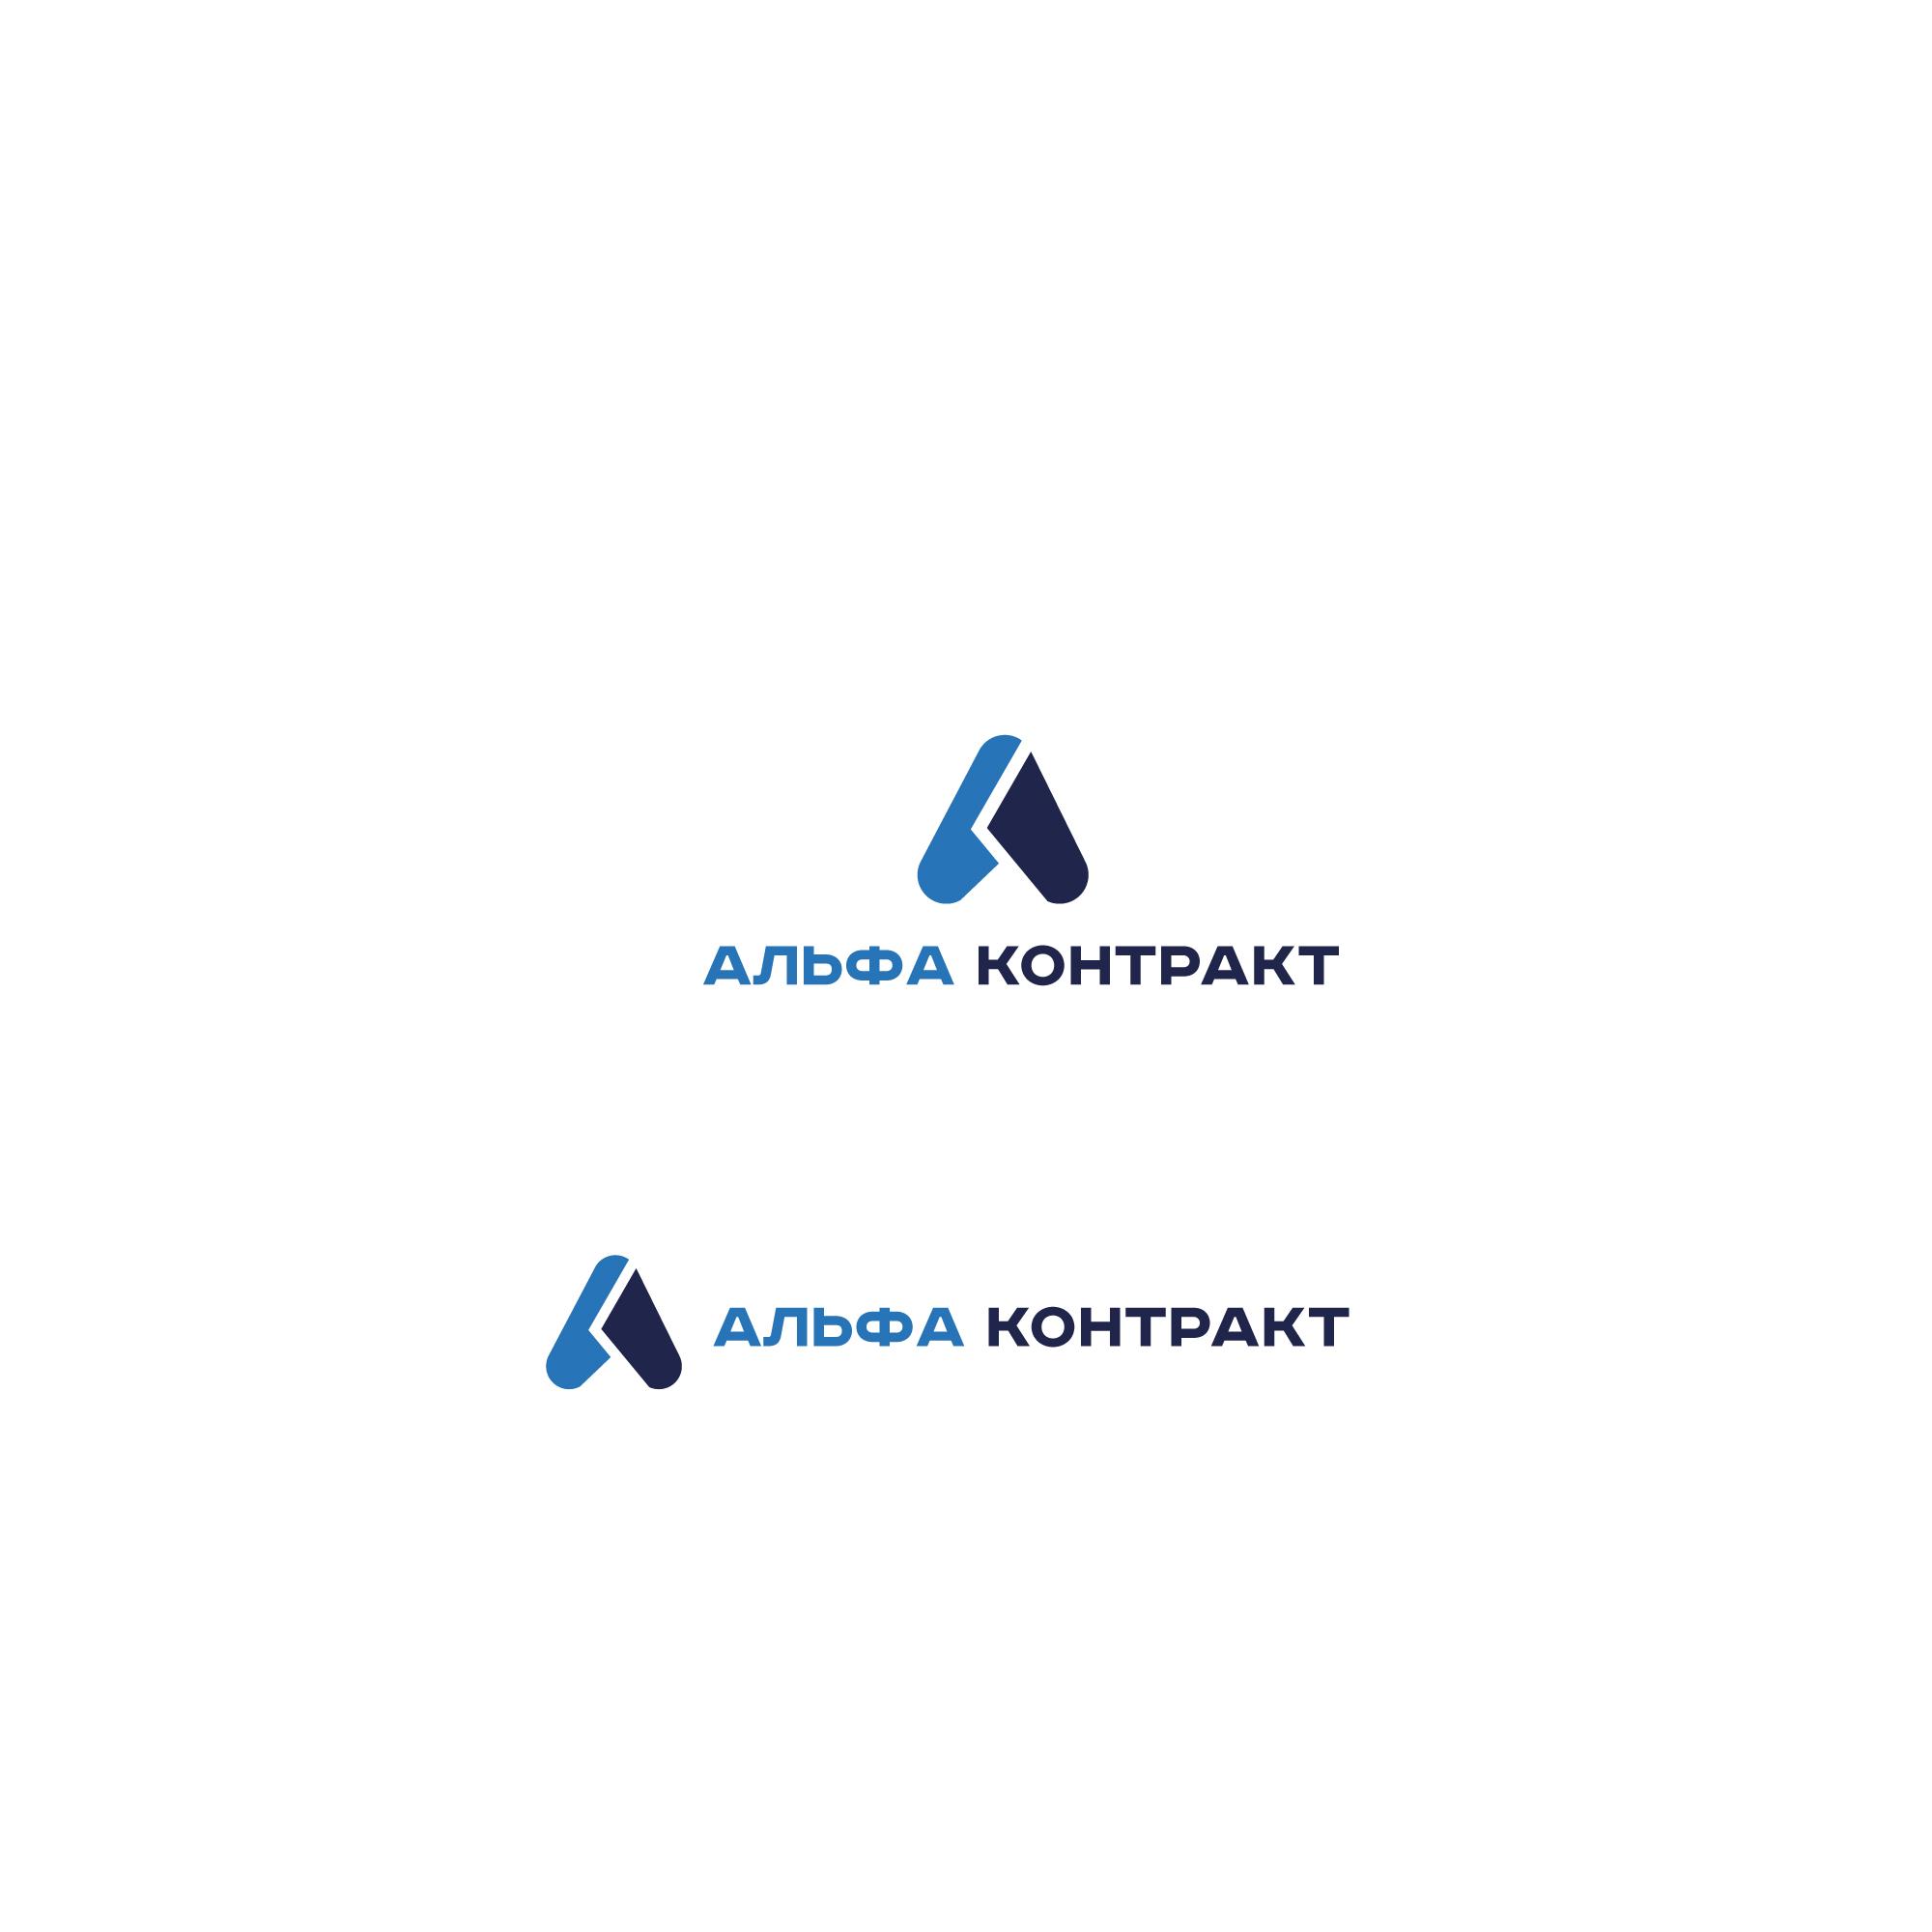 Дизайнер для разработки логотипа компании фото f_2435bfd2008d2777.jpg